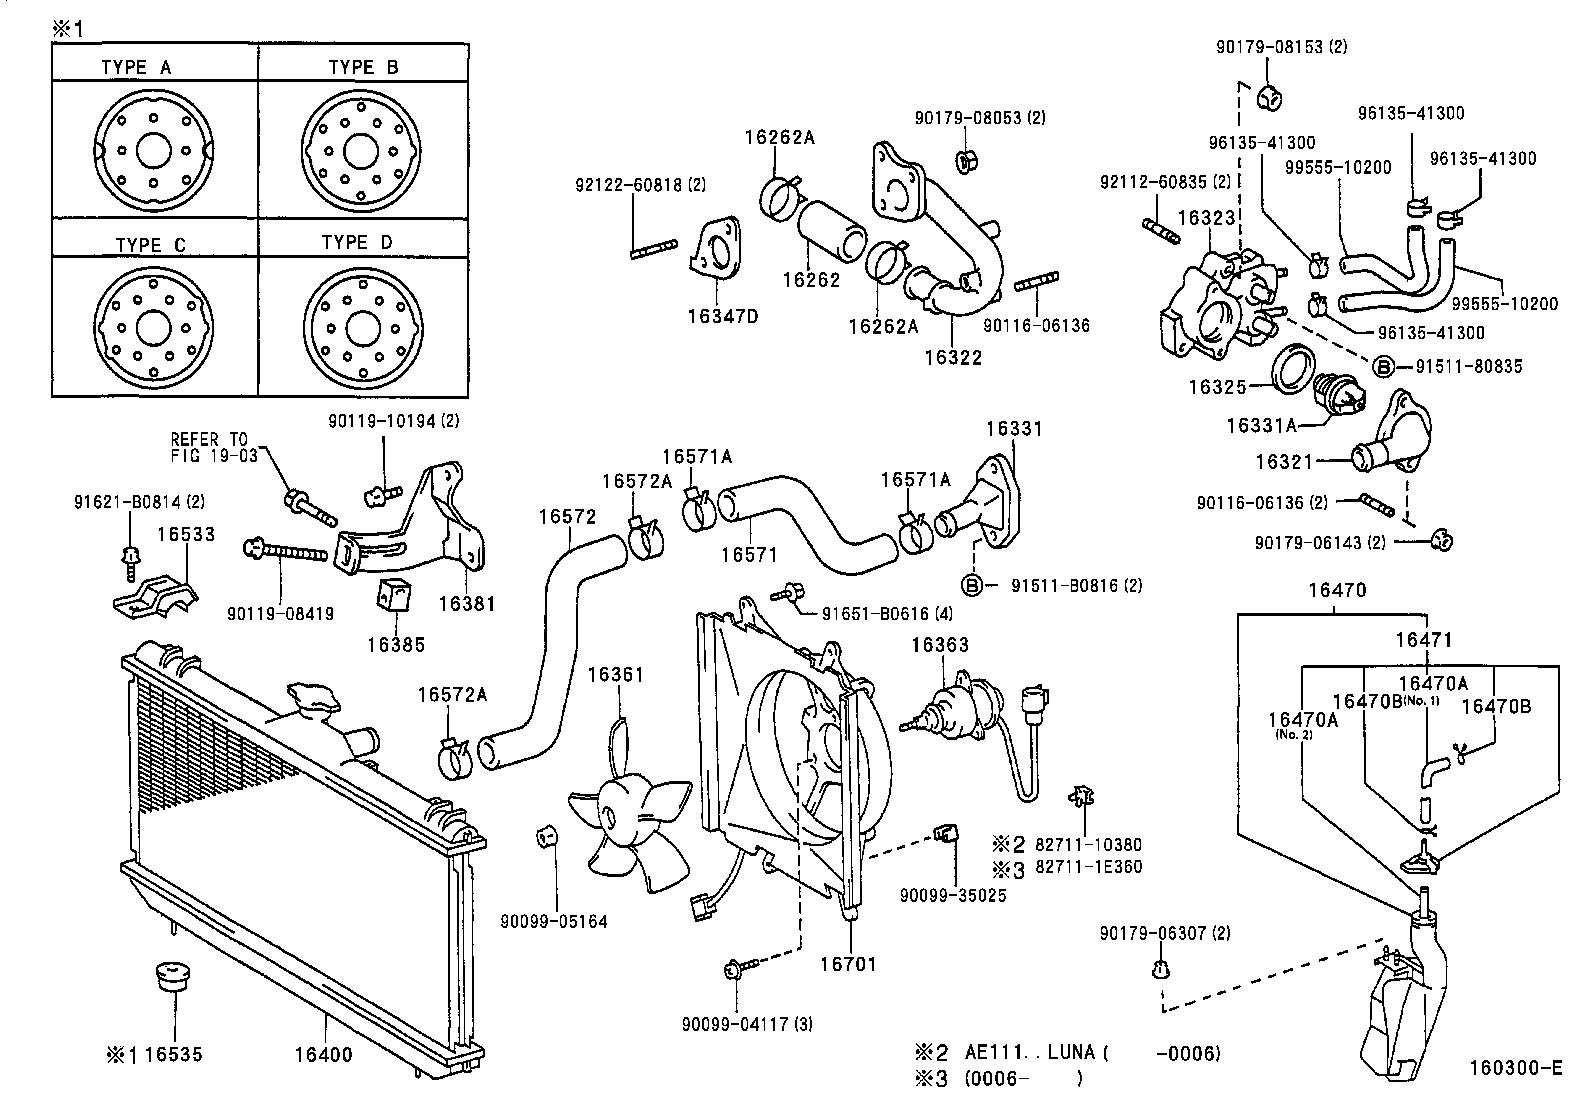 hight resolution of toyota corolla distributor diagram html imageresizertool com 2010 toyota corolla parts diagram 1994 toyota corolla parts diagrams